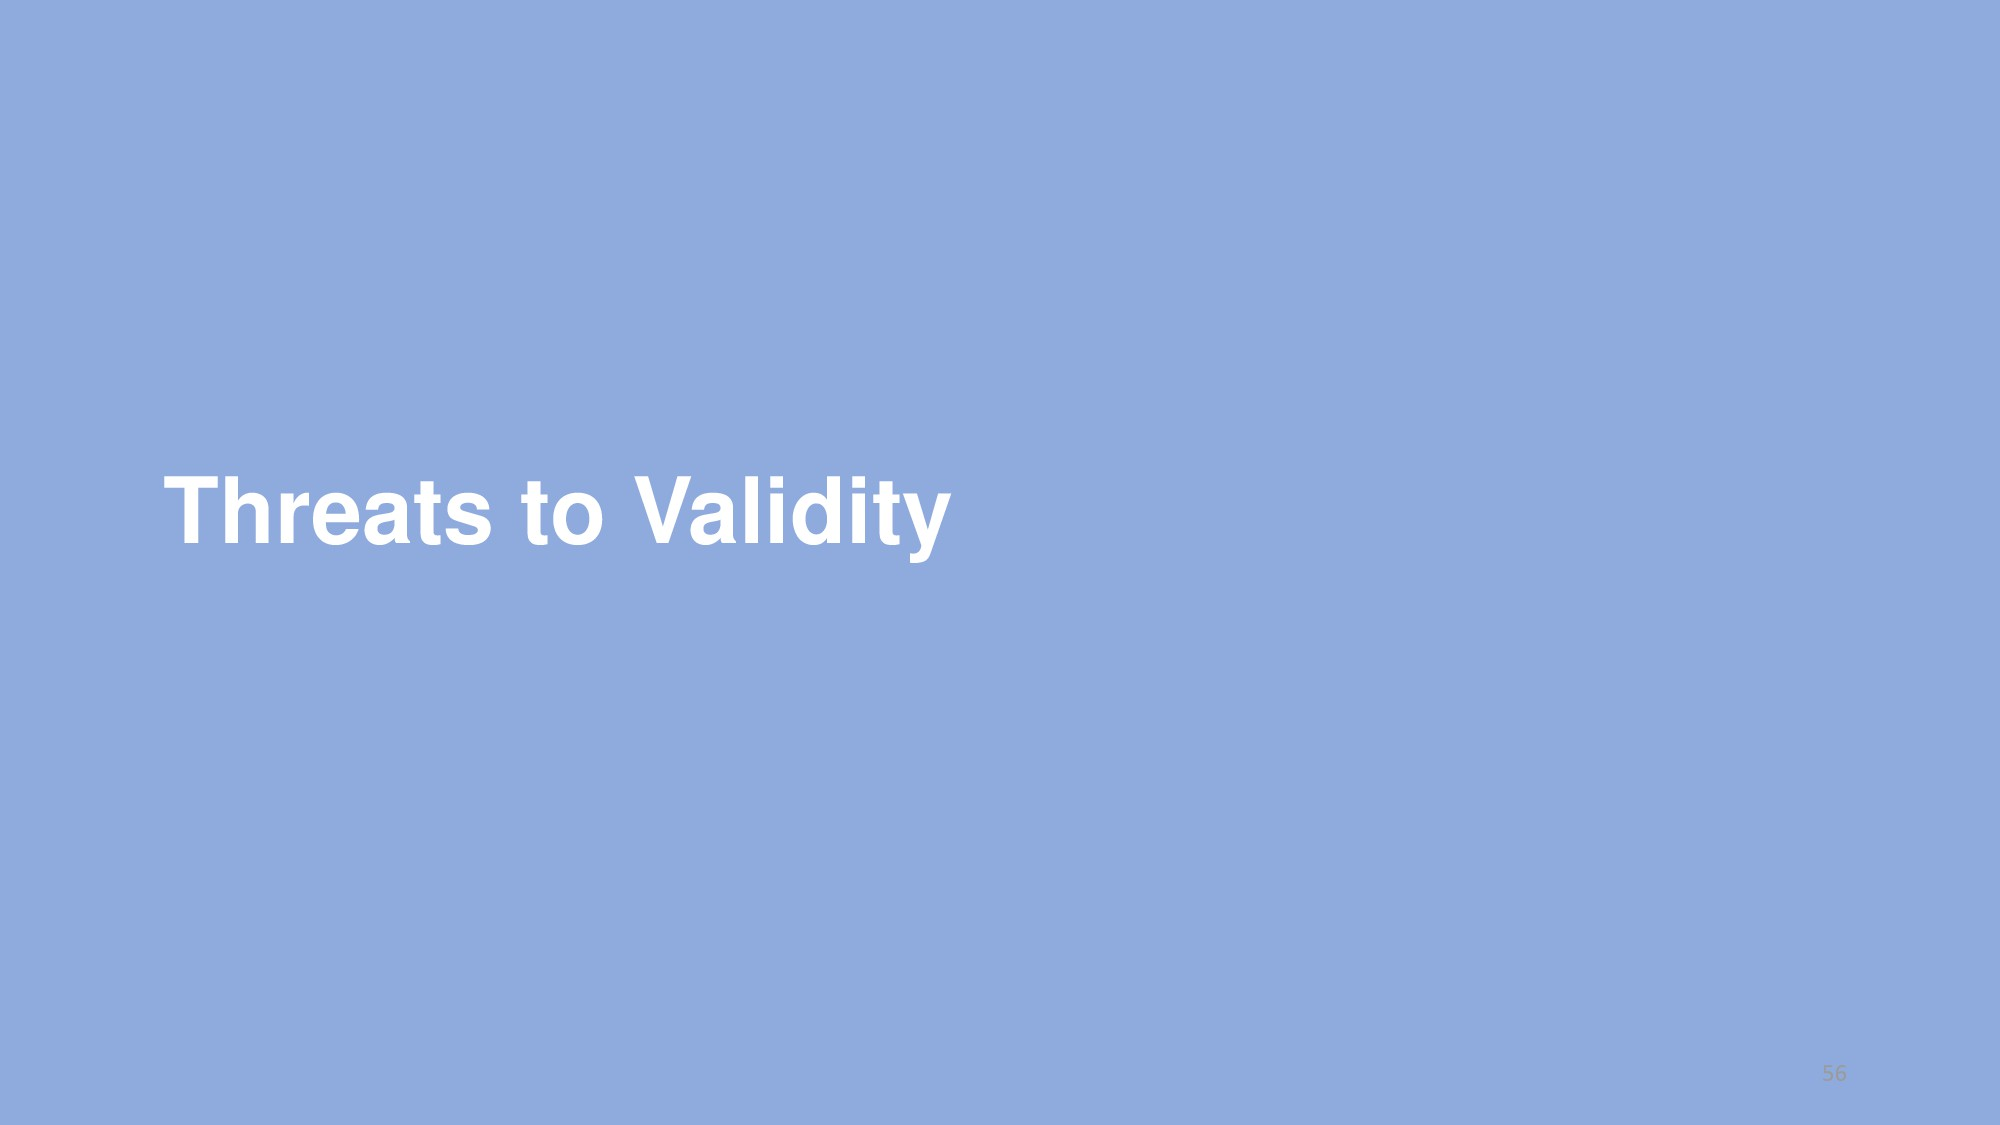 Threats to Validity 56